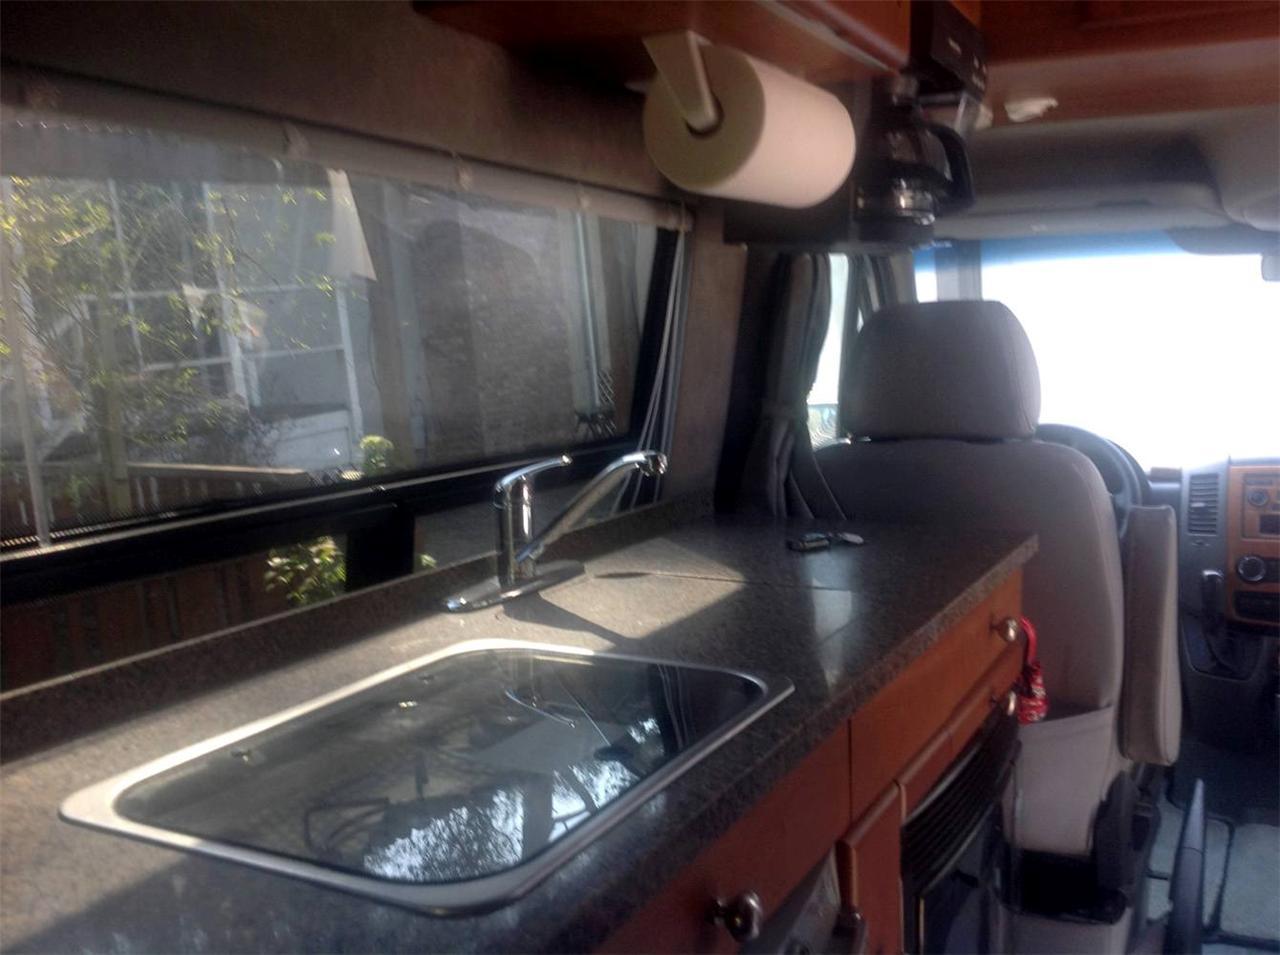 2007 Road Trek Sprinter Mercedes Benz Class B Grey Two Tone Vin Wdype 74575200